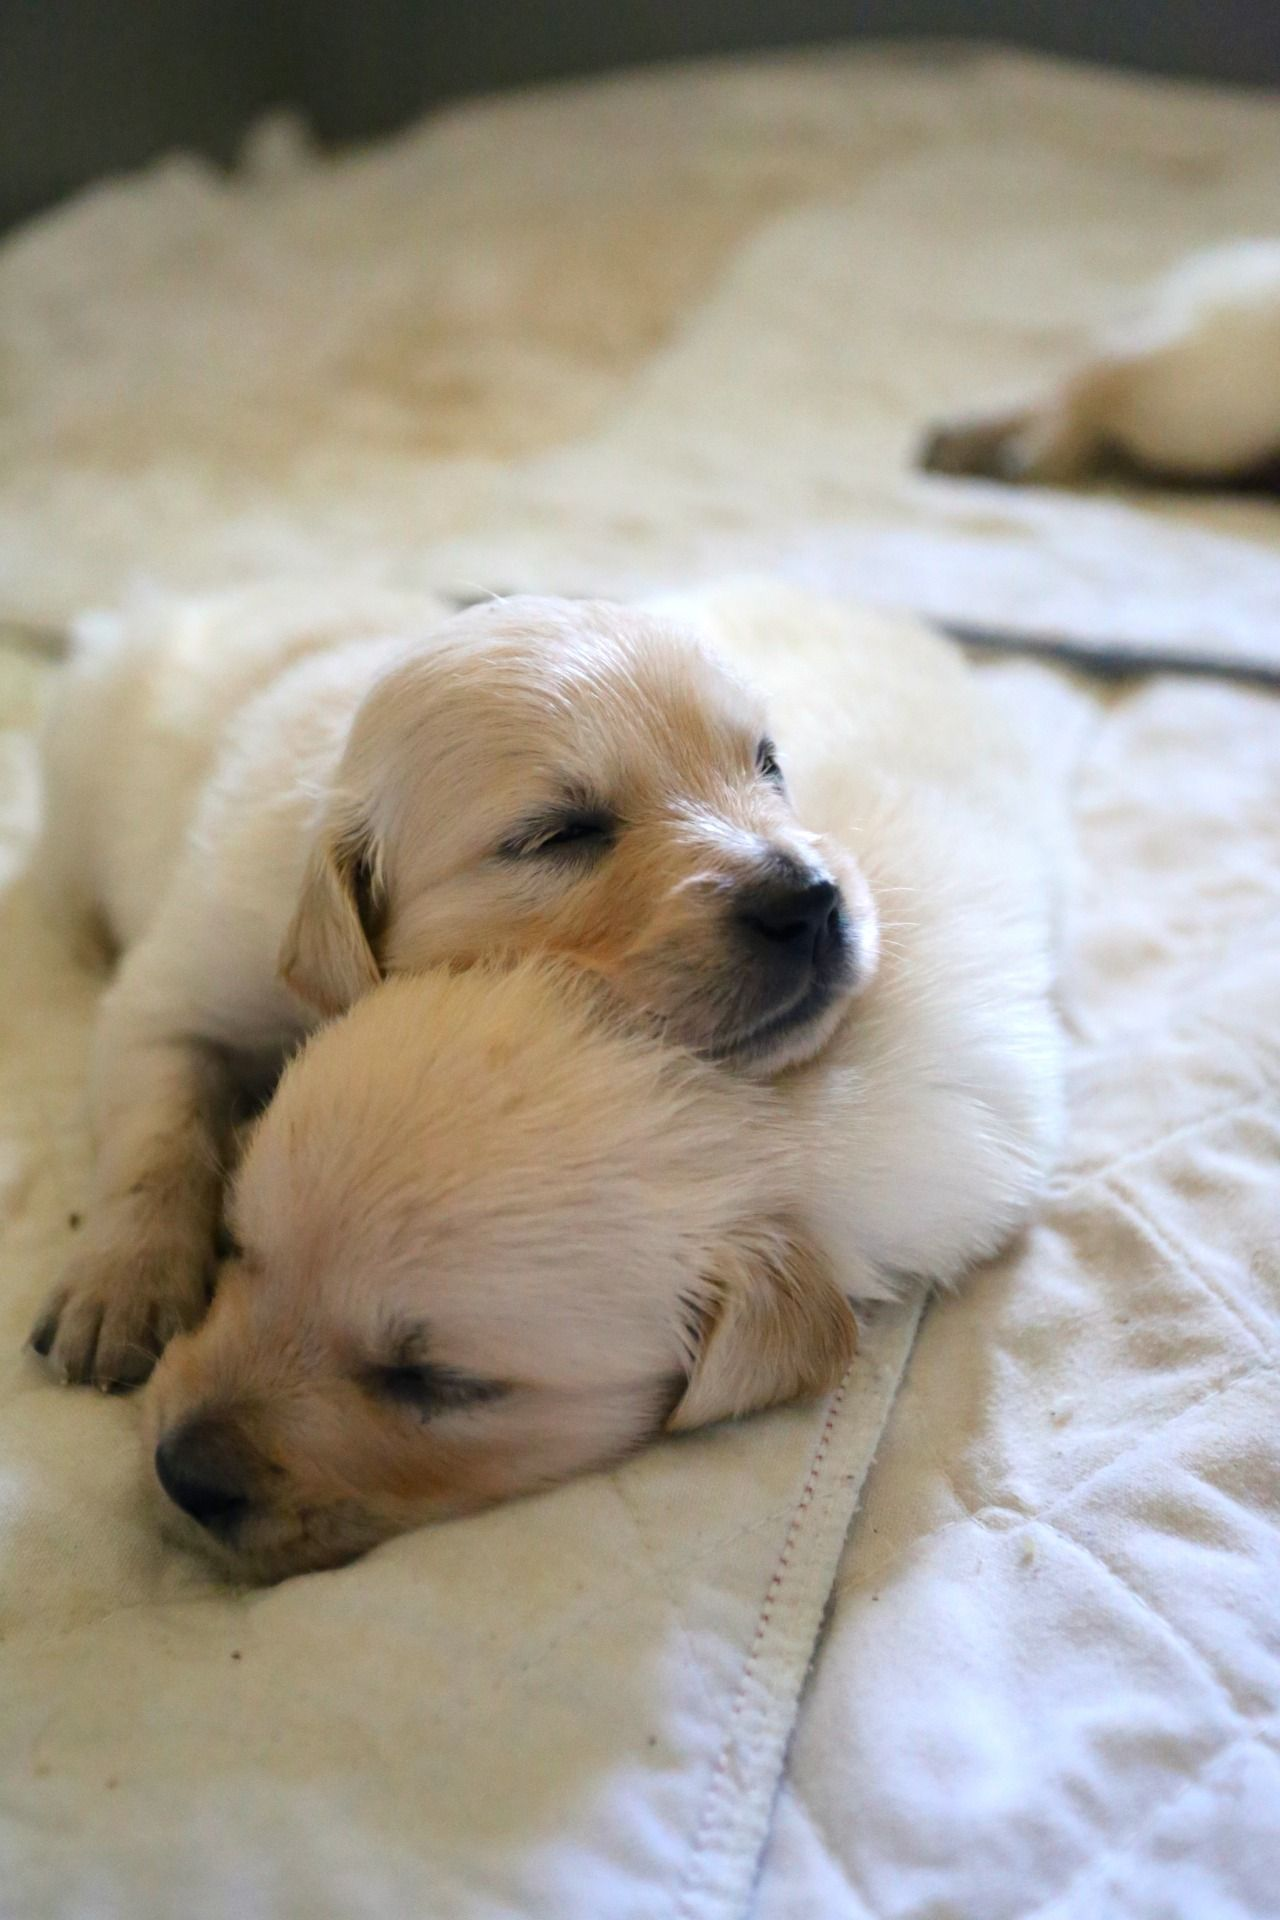 sleepy heads, puppy, pupps, dog, cute, nuttet, adorable, sweet